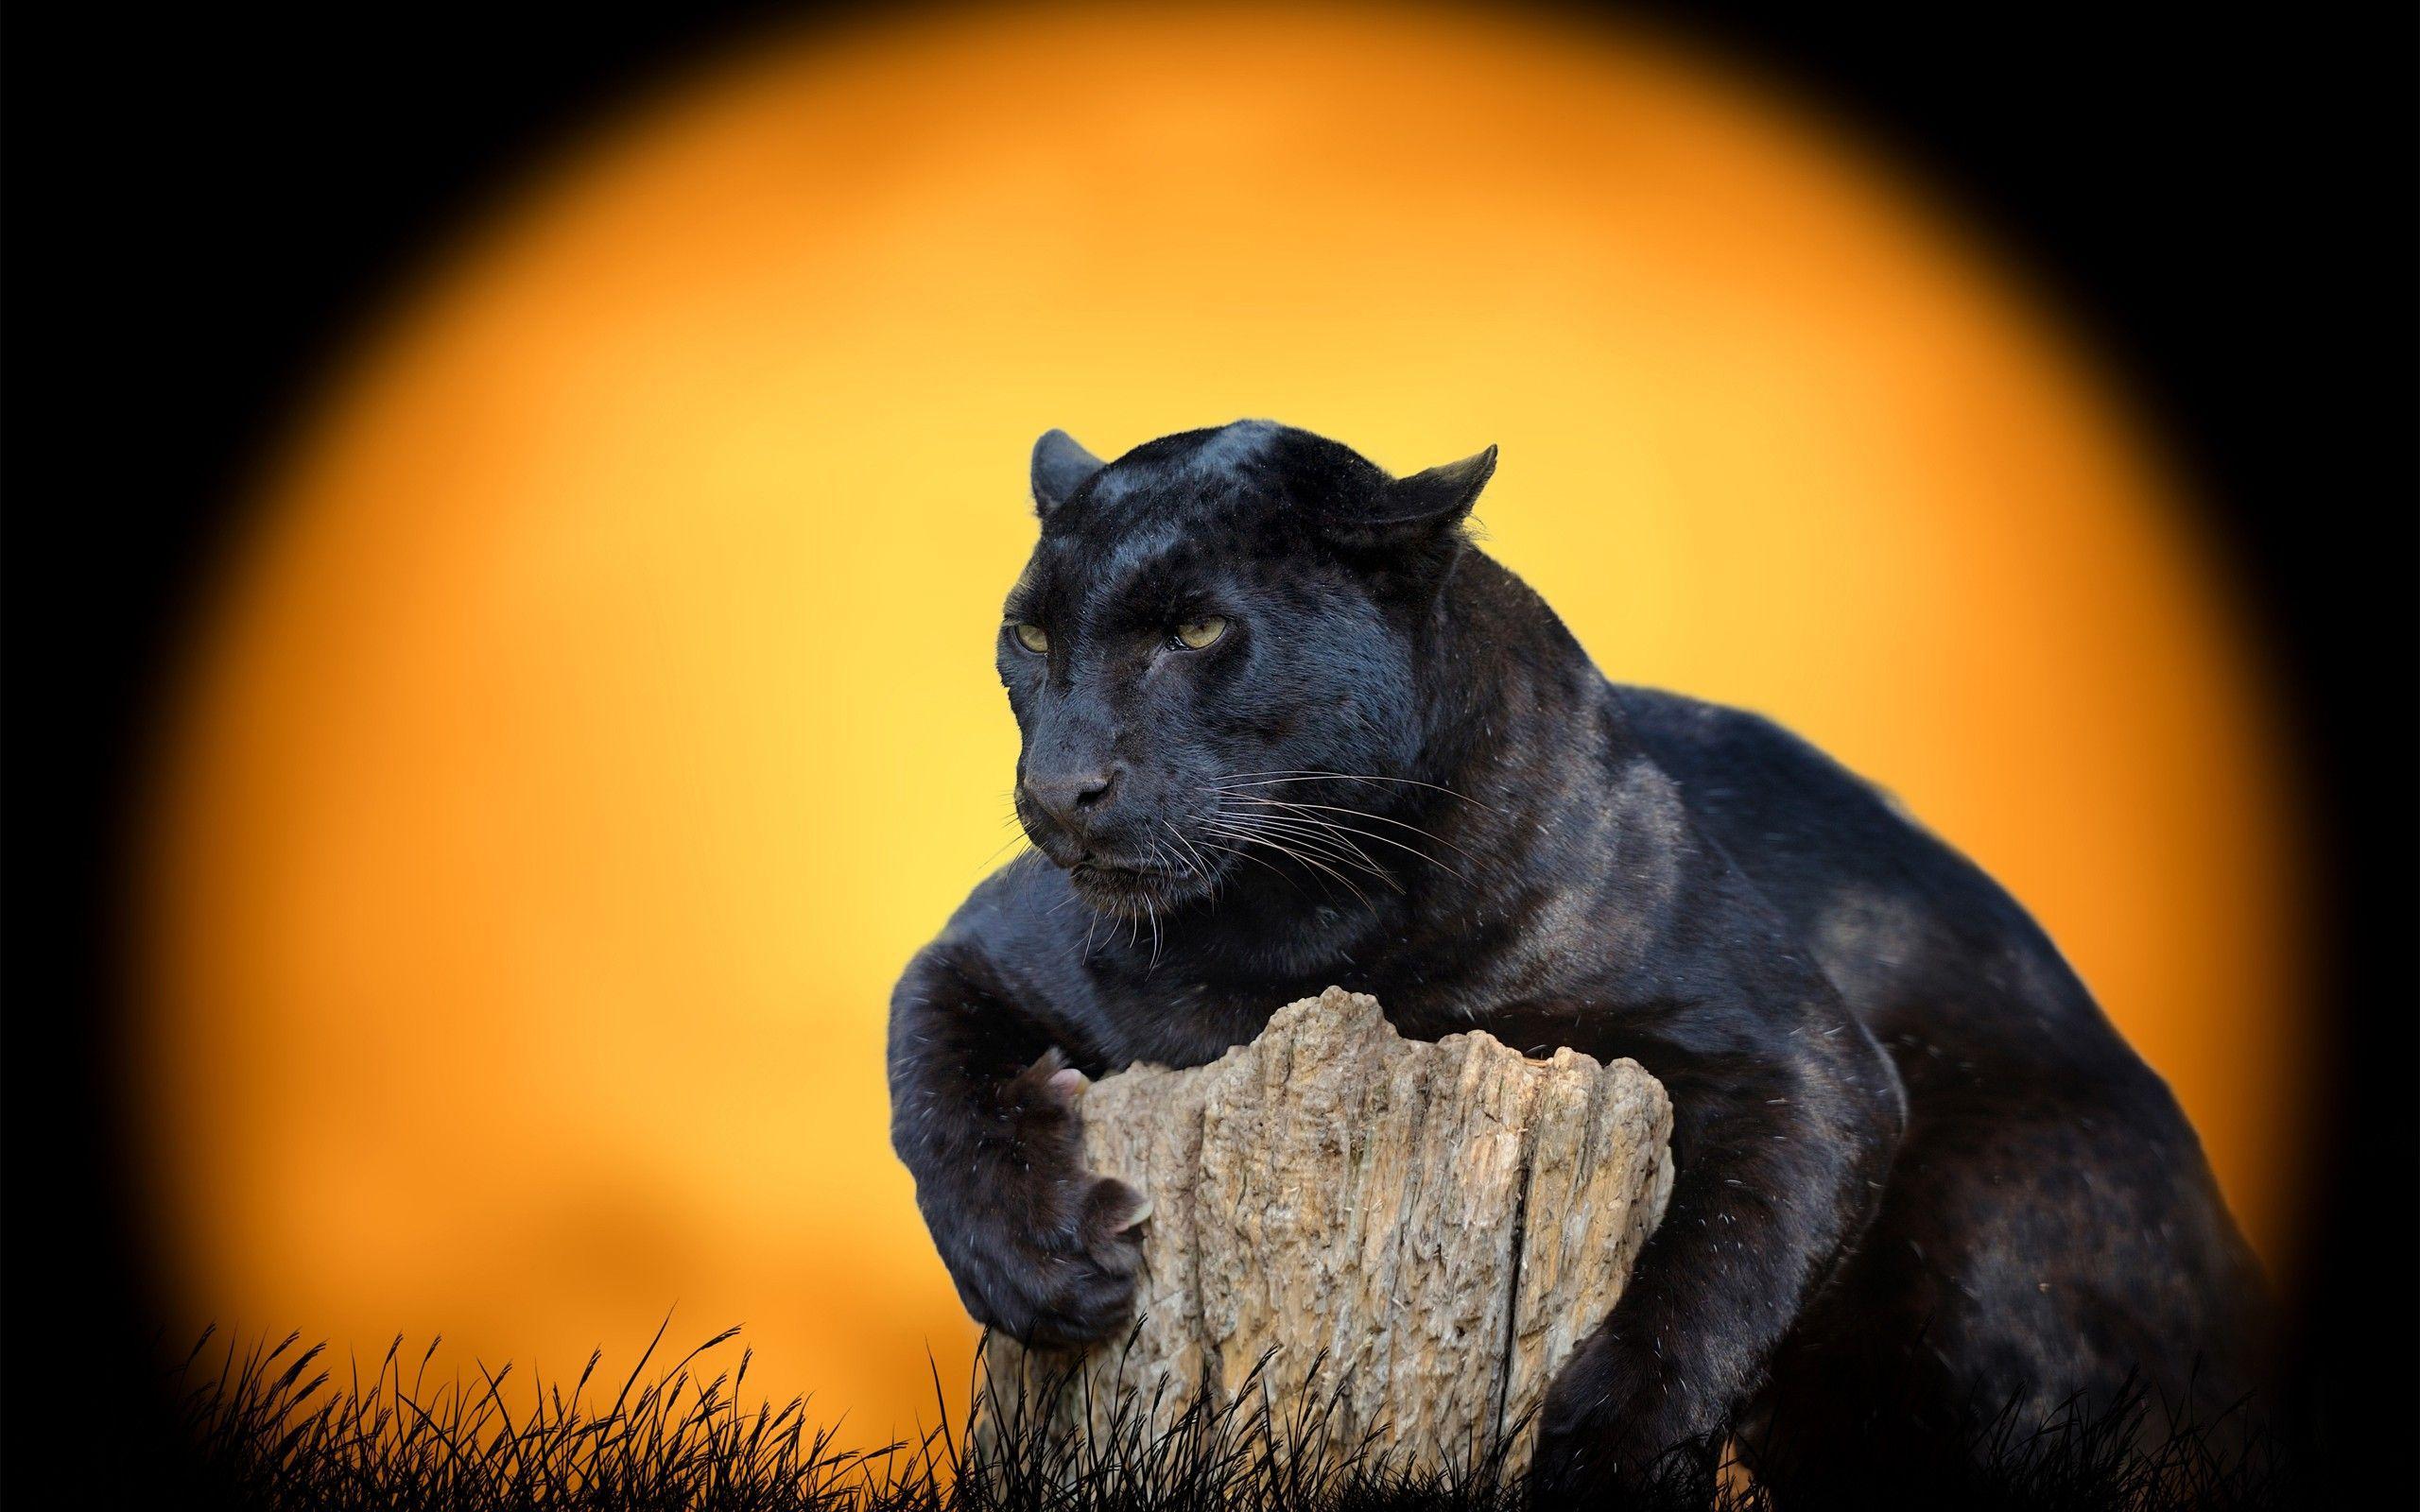 Jaguar Animal Wallpapers Top Free Jaguar Animal Backgrounds Wallpaperaccess